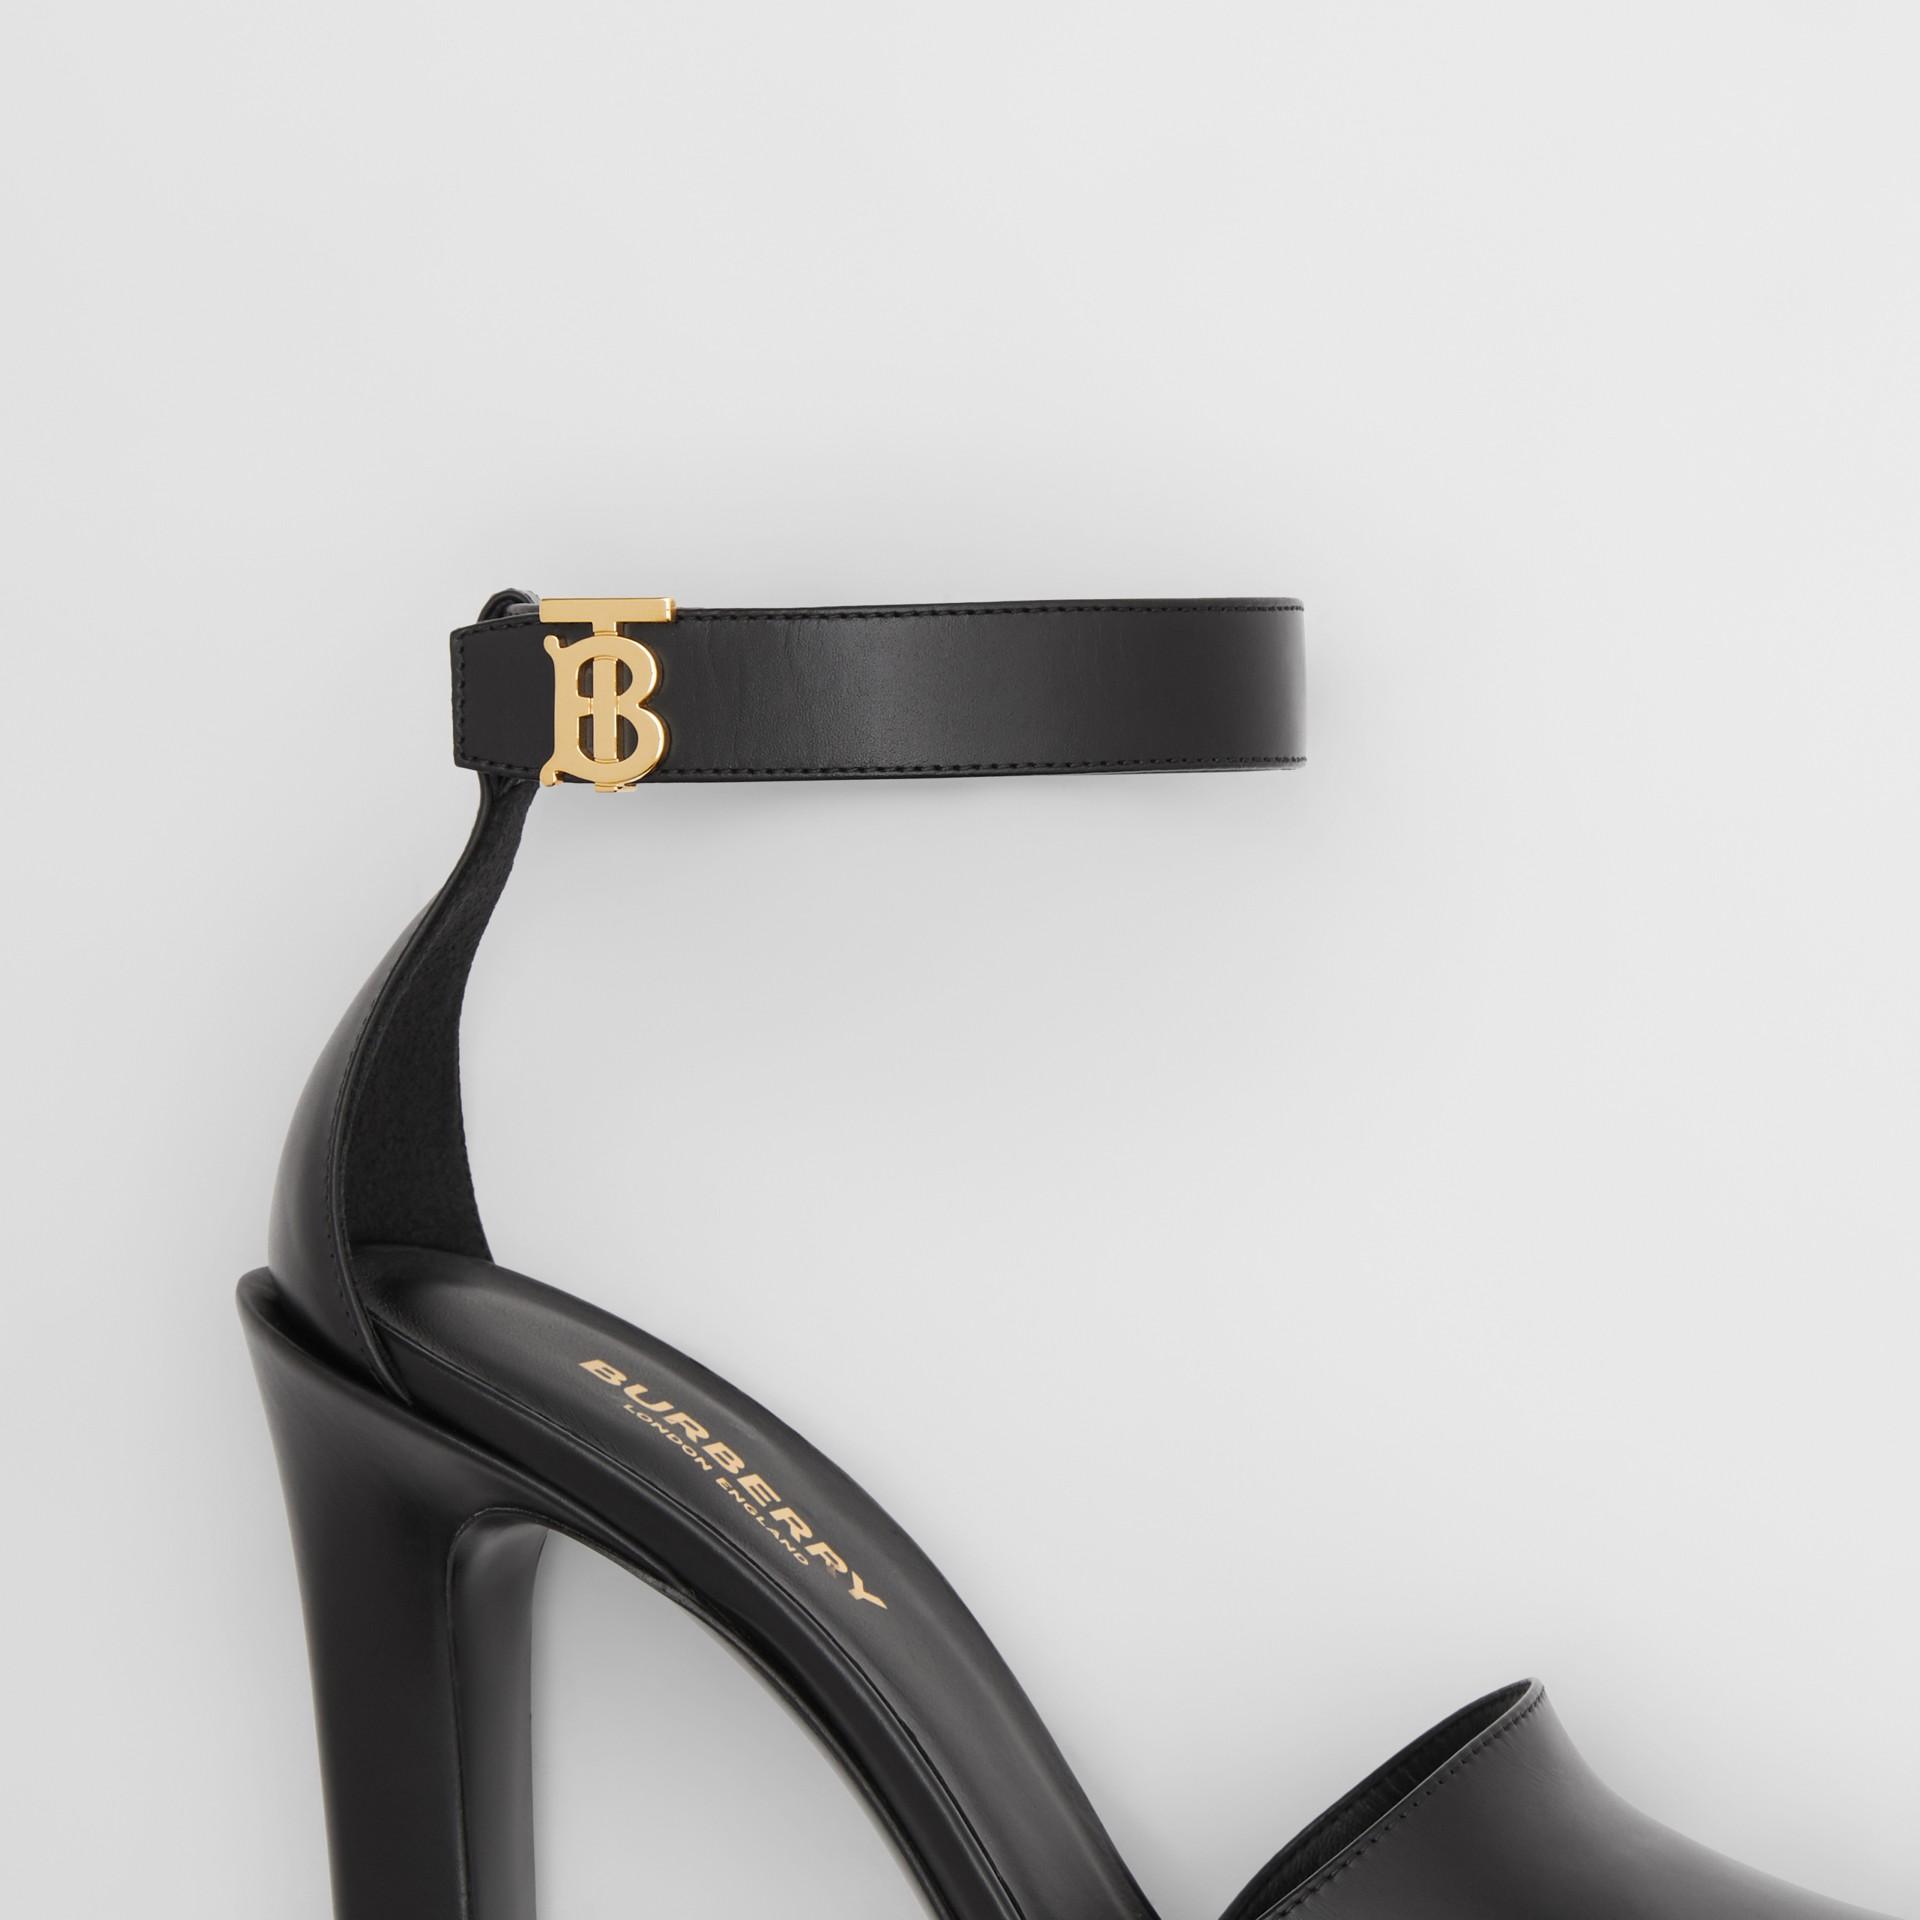 Monogram Motif Leather Peep-toe Sandals in Black - Women | Burberry - gallery image 5